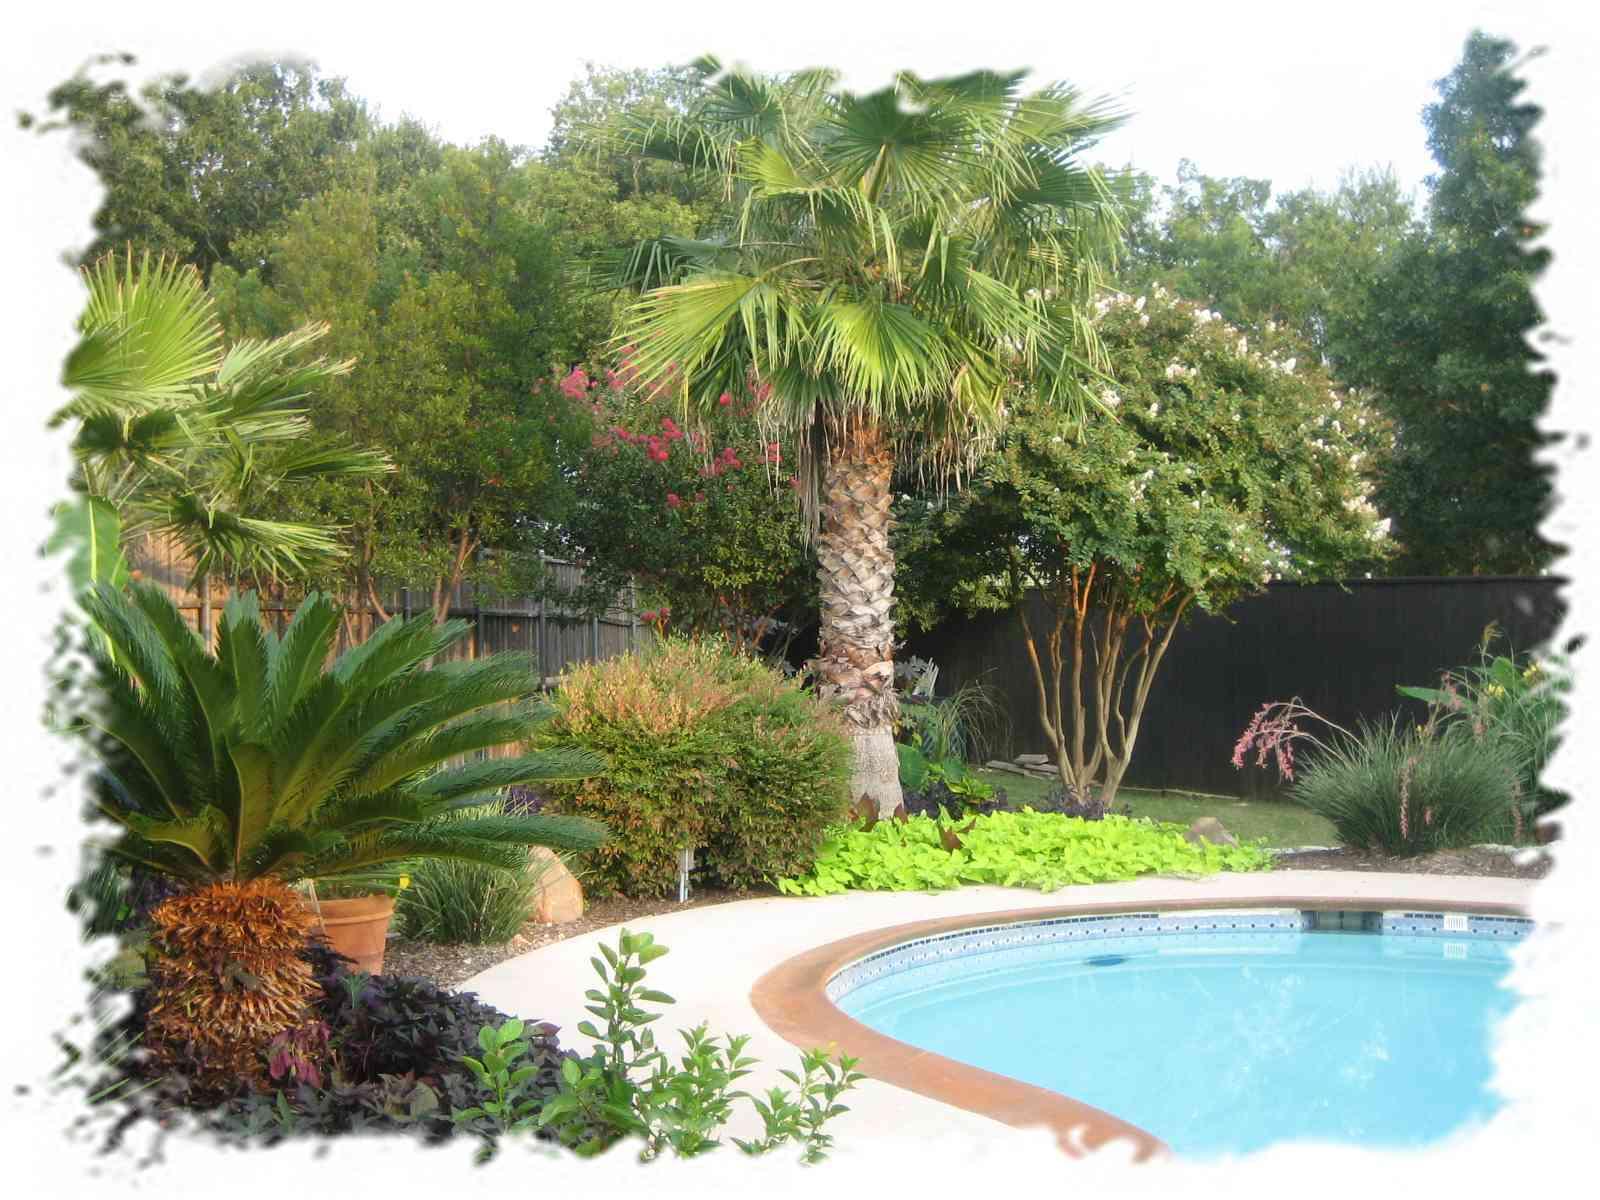 Free photo: palm trees backyard - Backyard, Branches ... on Palm Tree Backyard Ideas id=44978